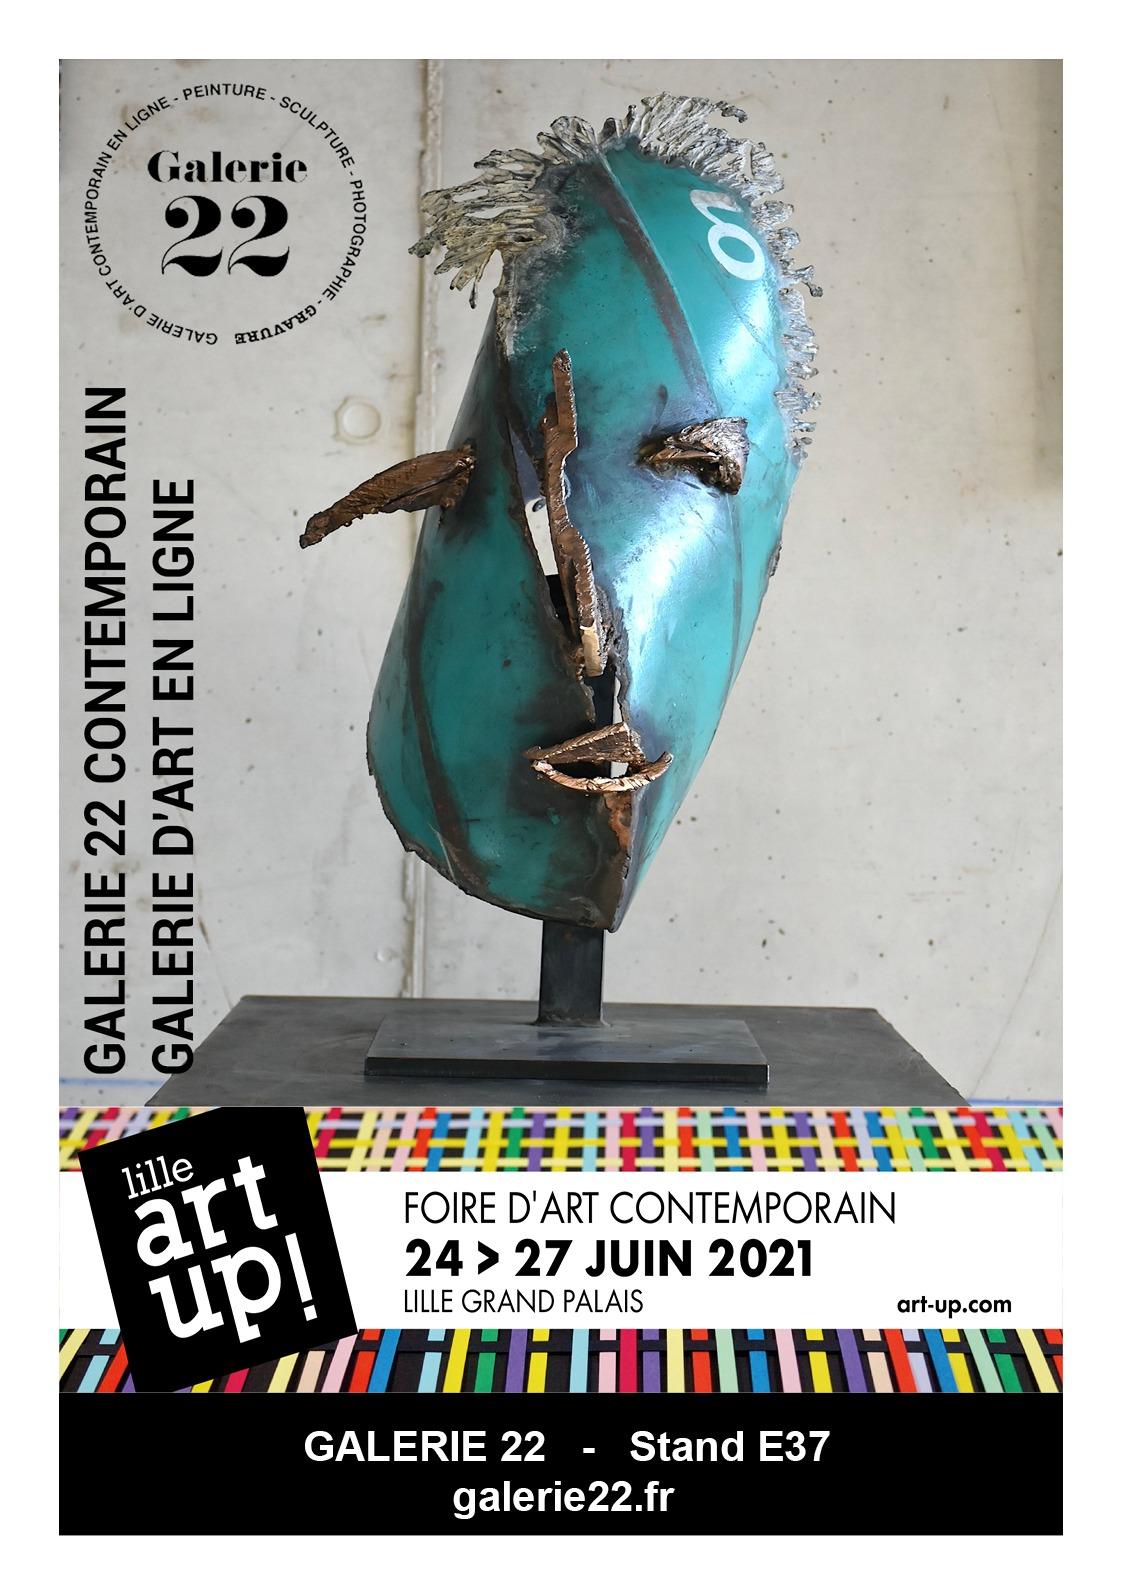 salon d'art contemporain lille art up